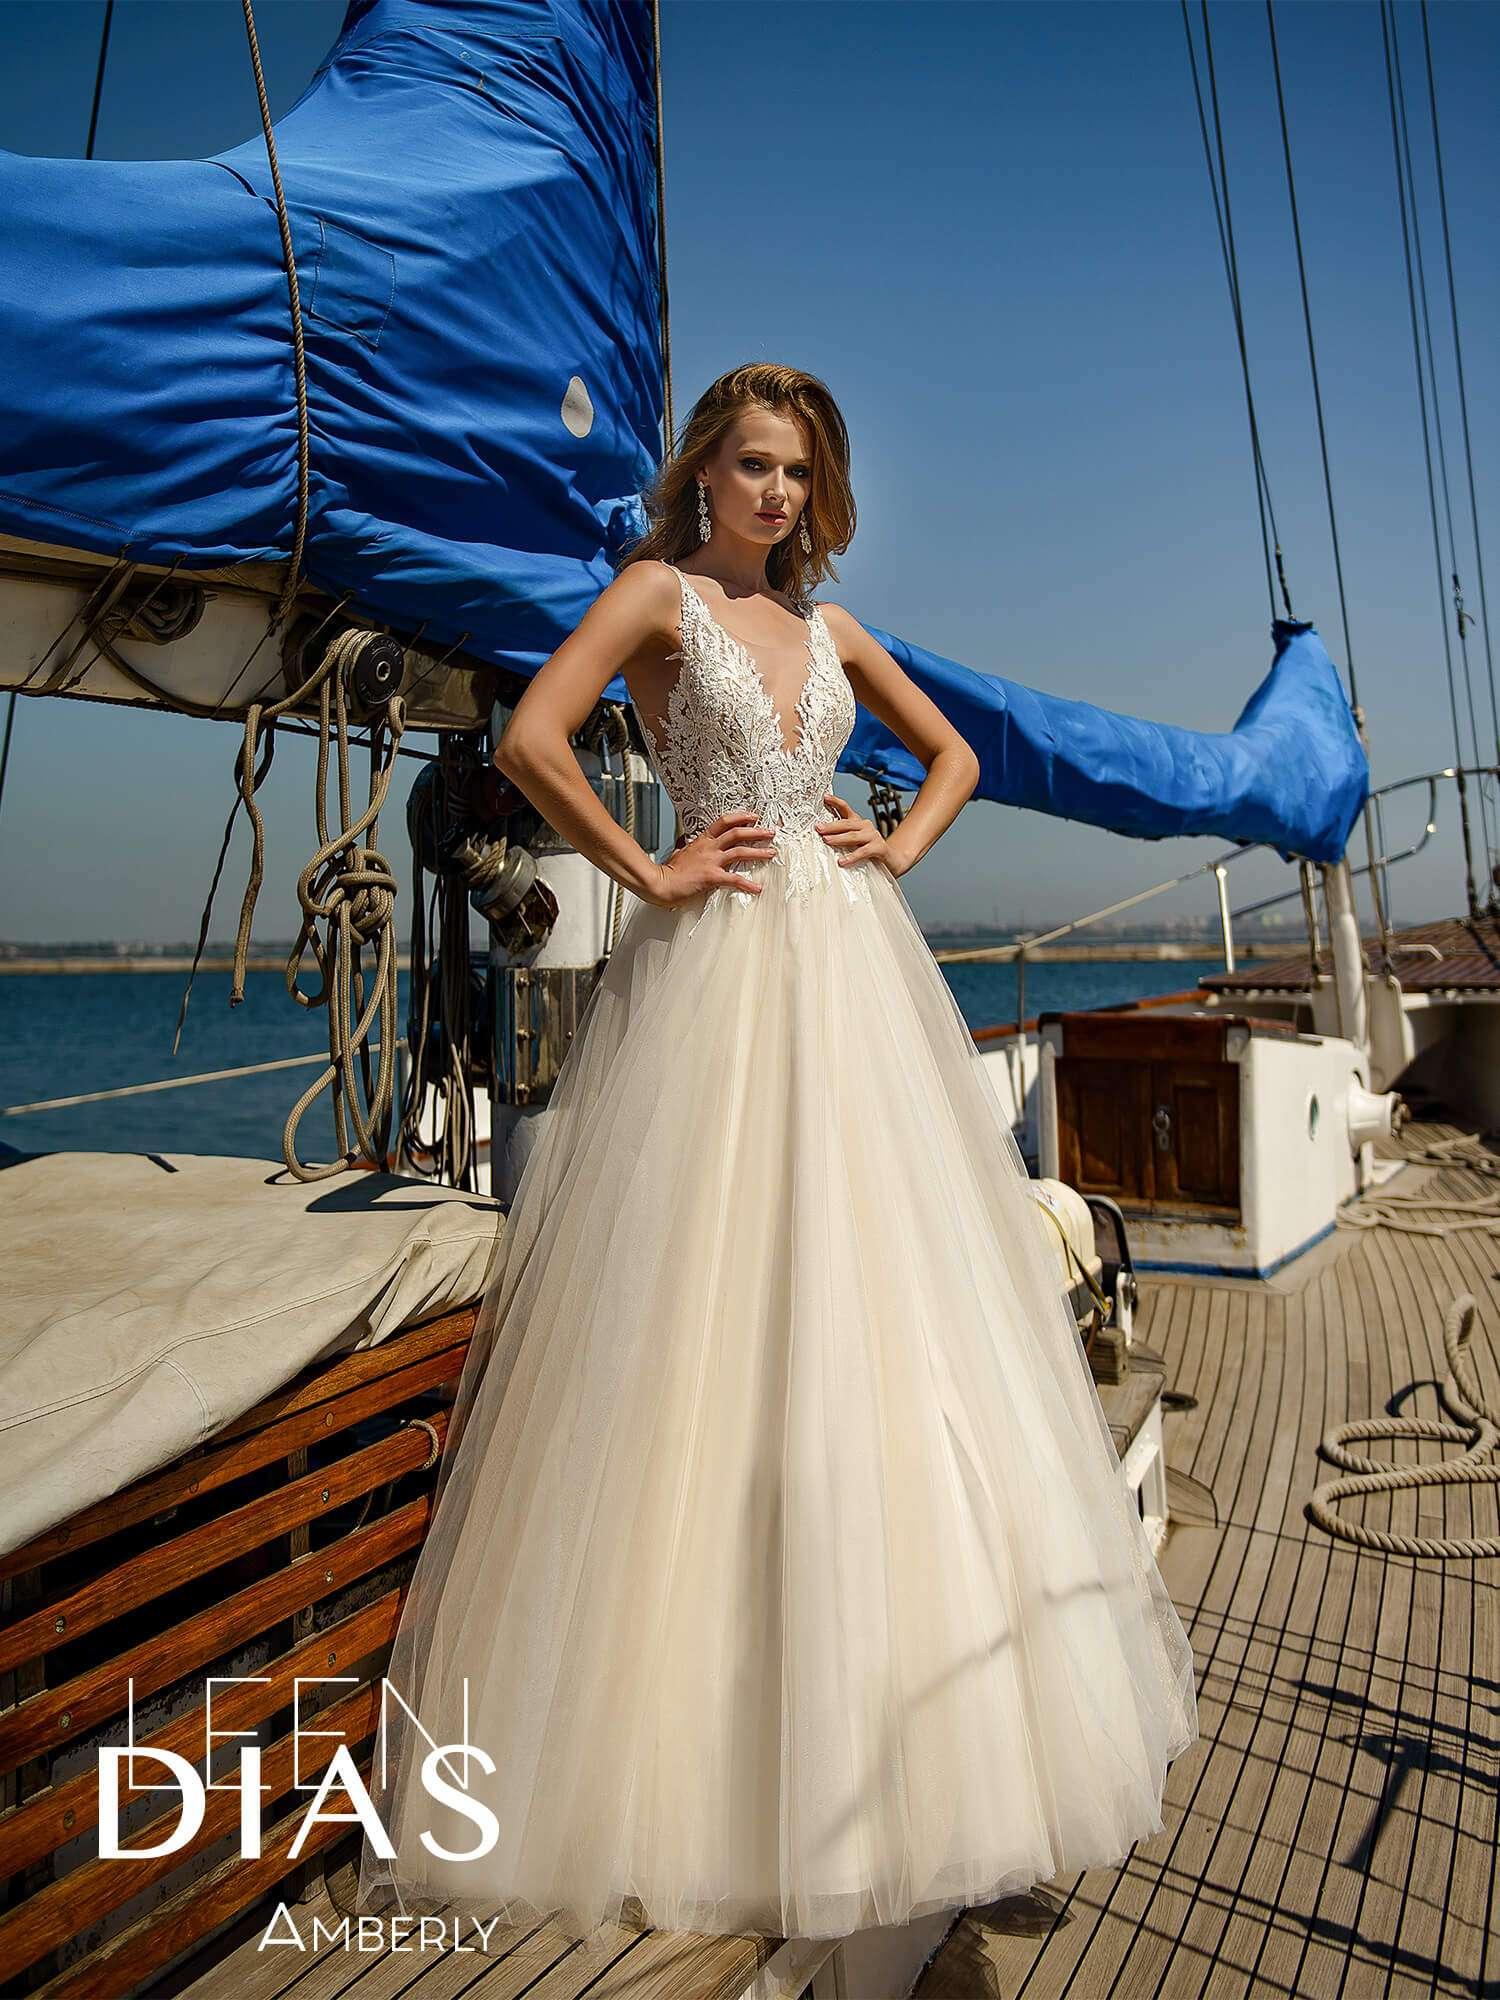 свадебное платье Amberly-1.1800x1800w